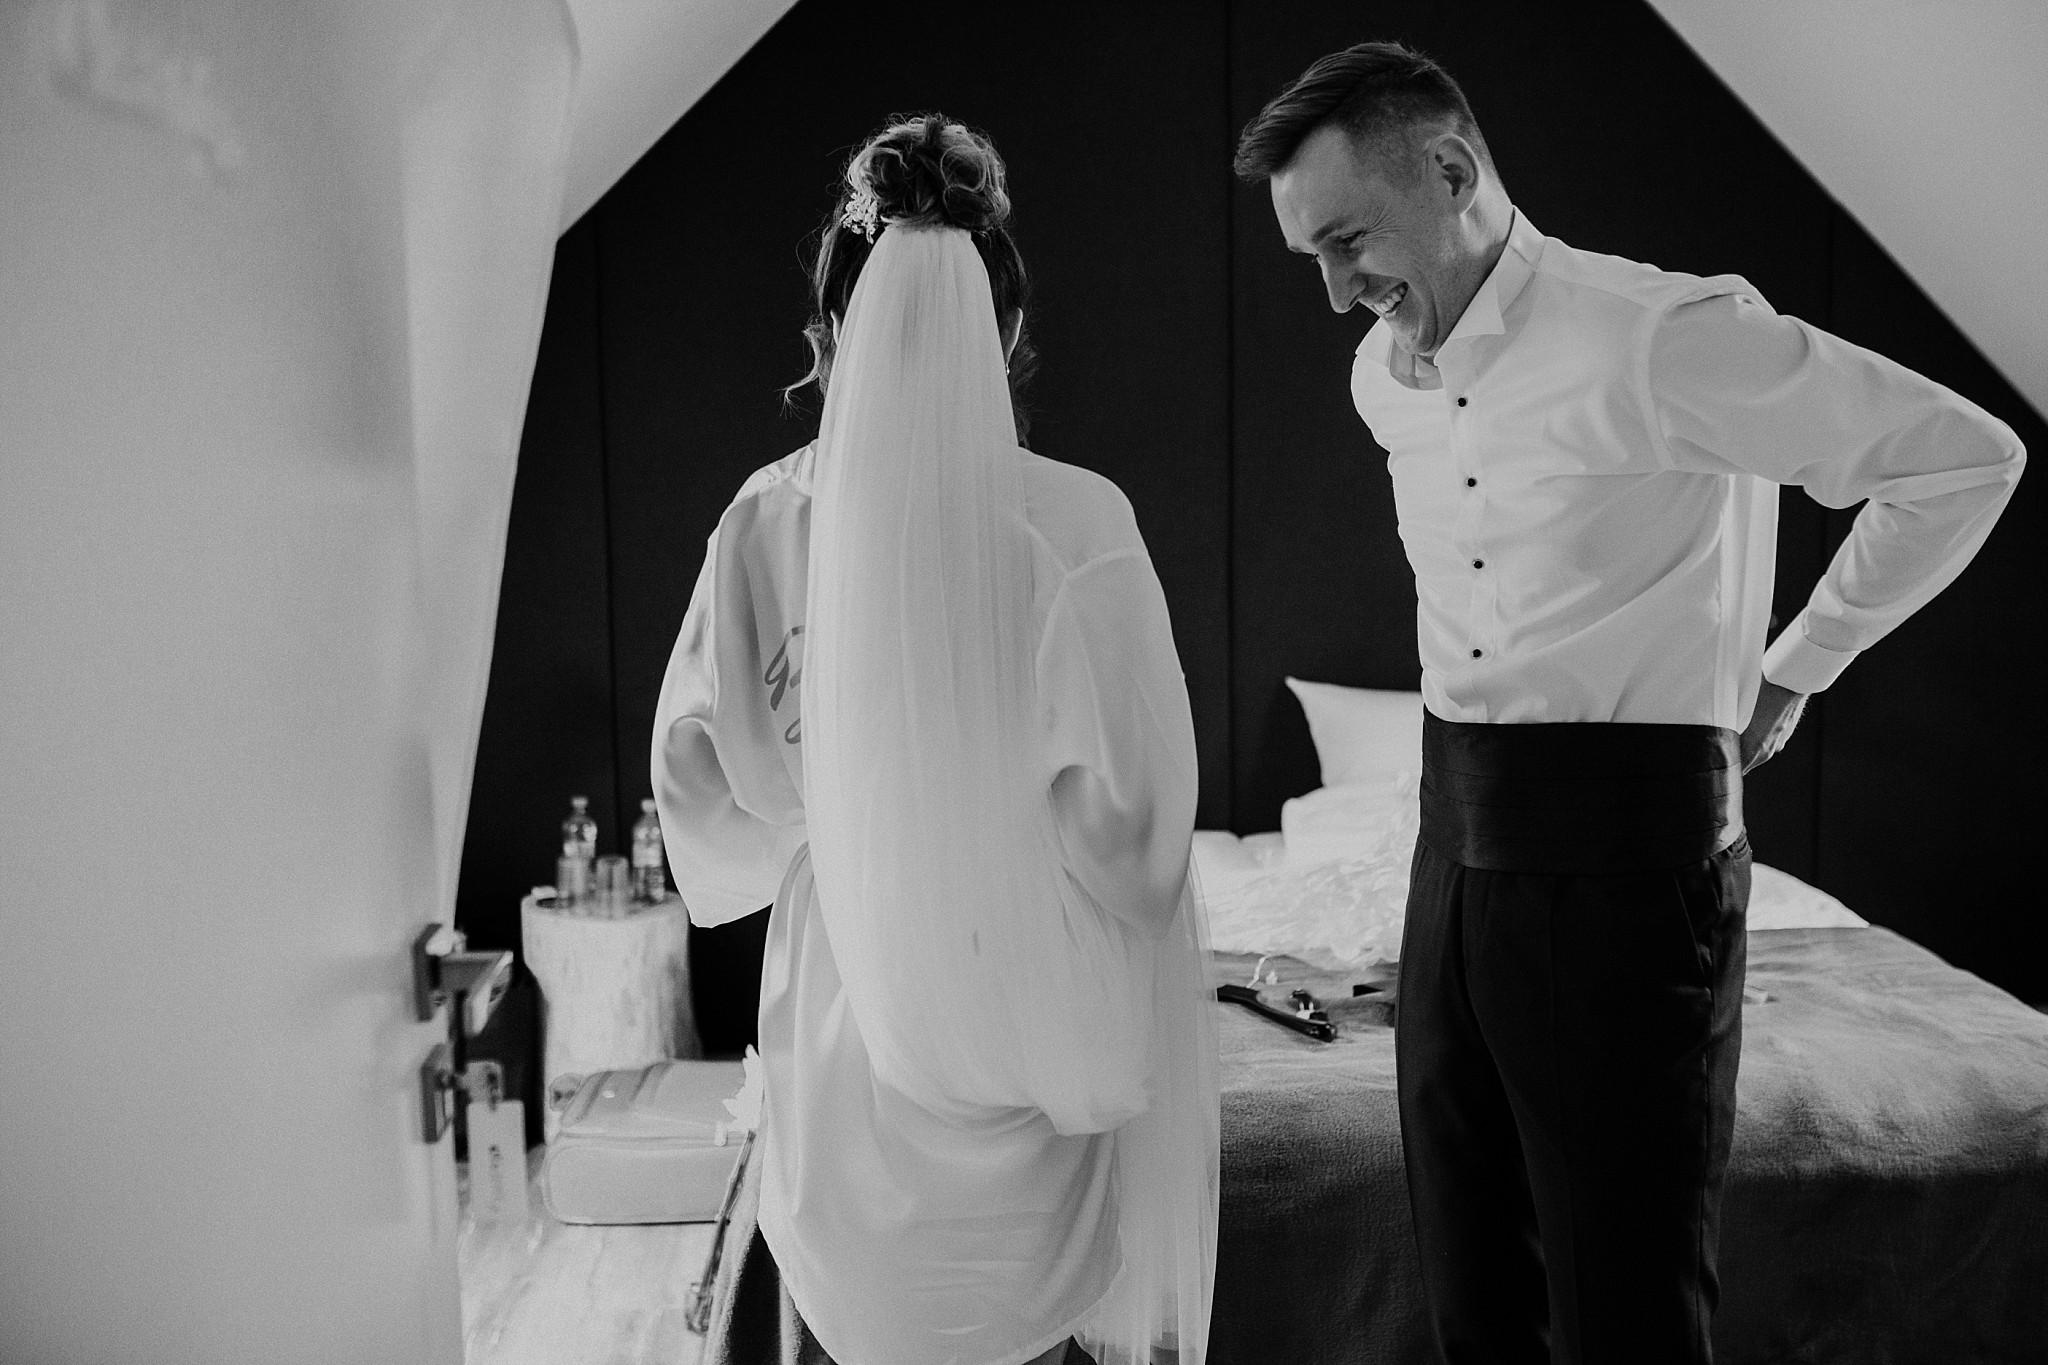 fotograf poznan wesele dobra truskawka piekne wesele pod poznaniem wesele w dobrej truskawce piekna para mloda slub marzen slub koronawirus slub listopad wesele koronawirus 044